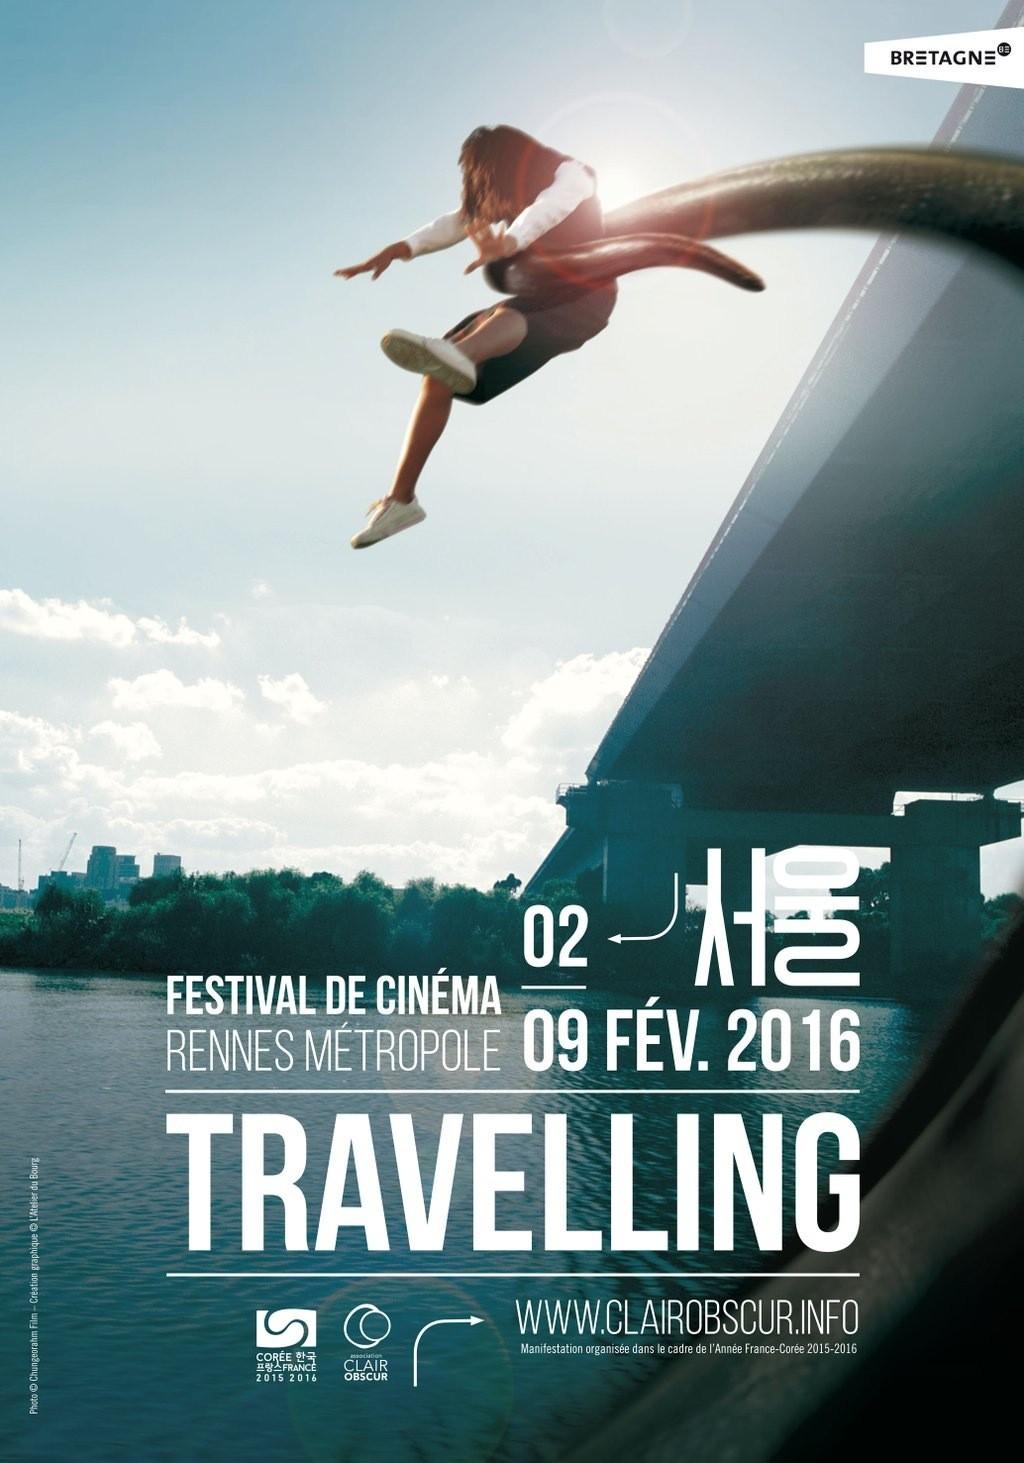 Travelling festival affiche